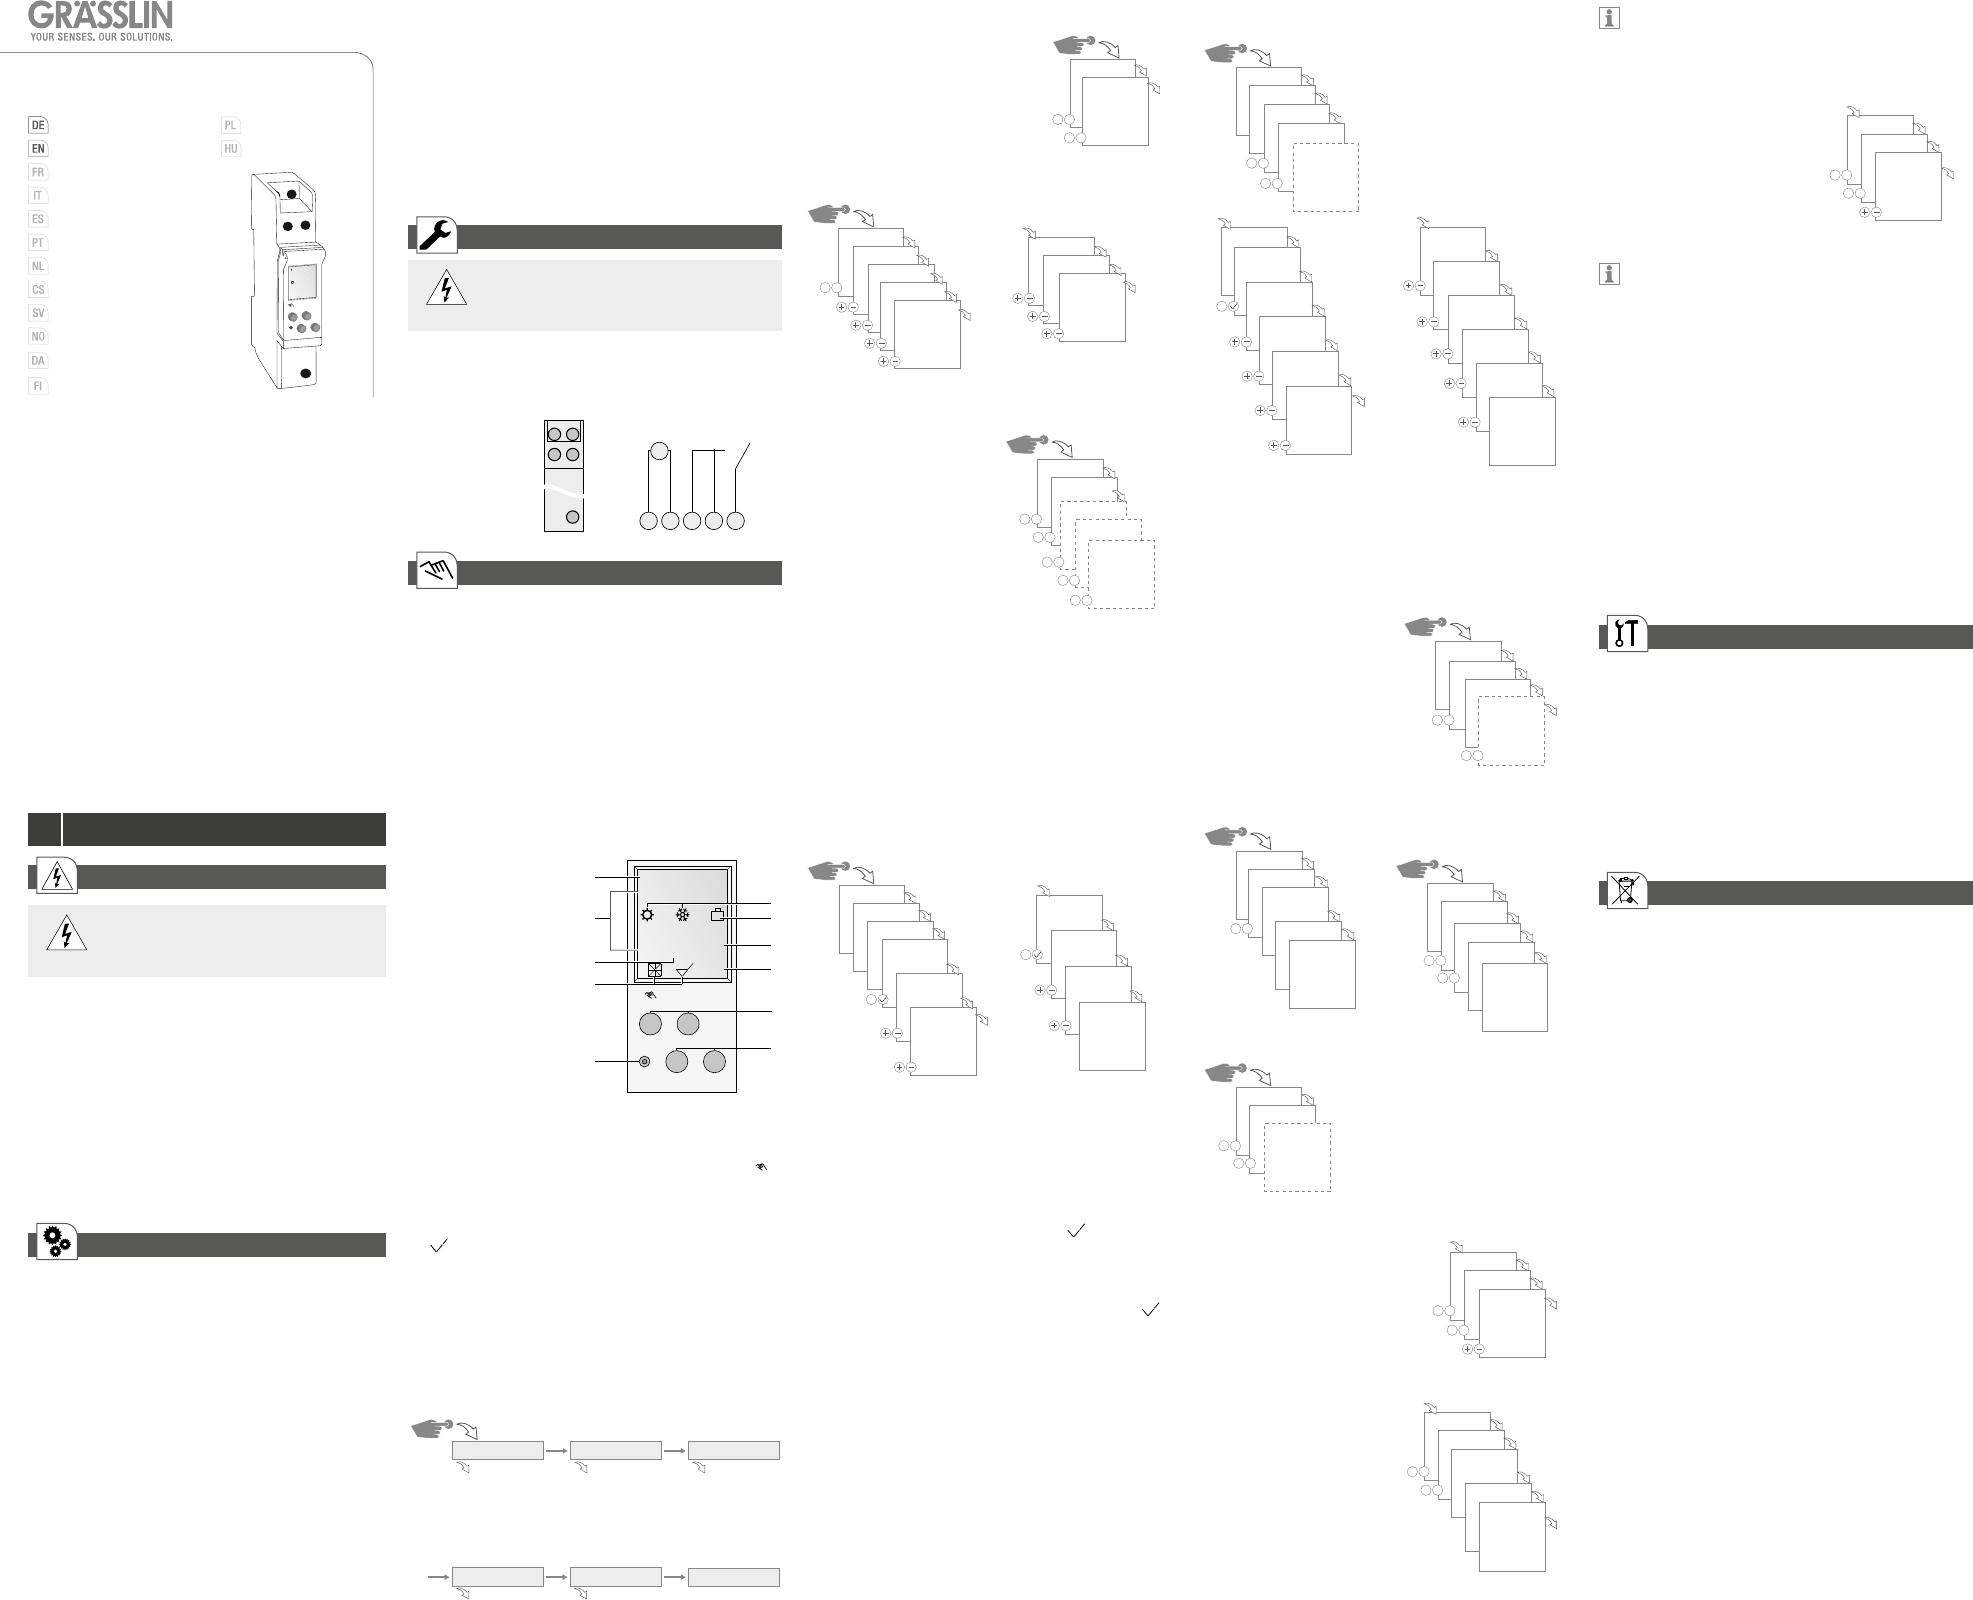 grasslin talento 371 mini user manual